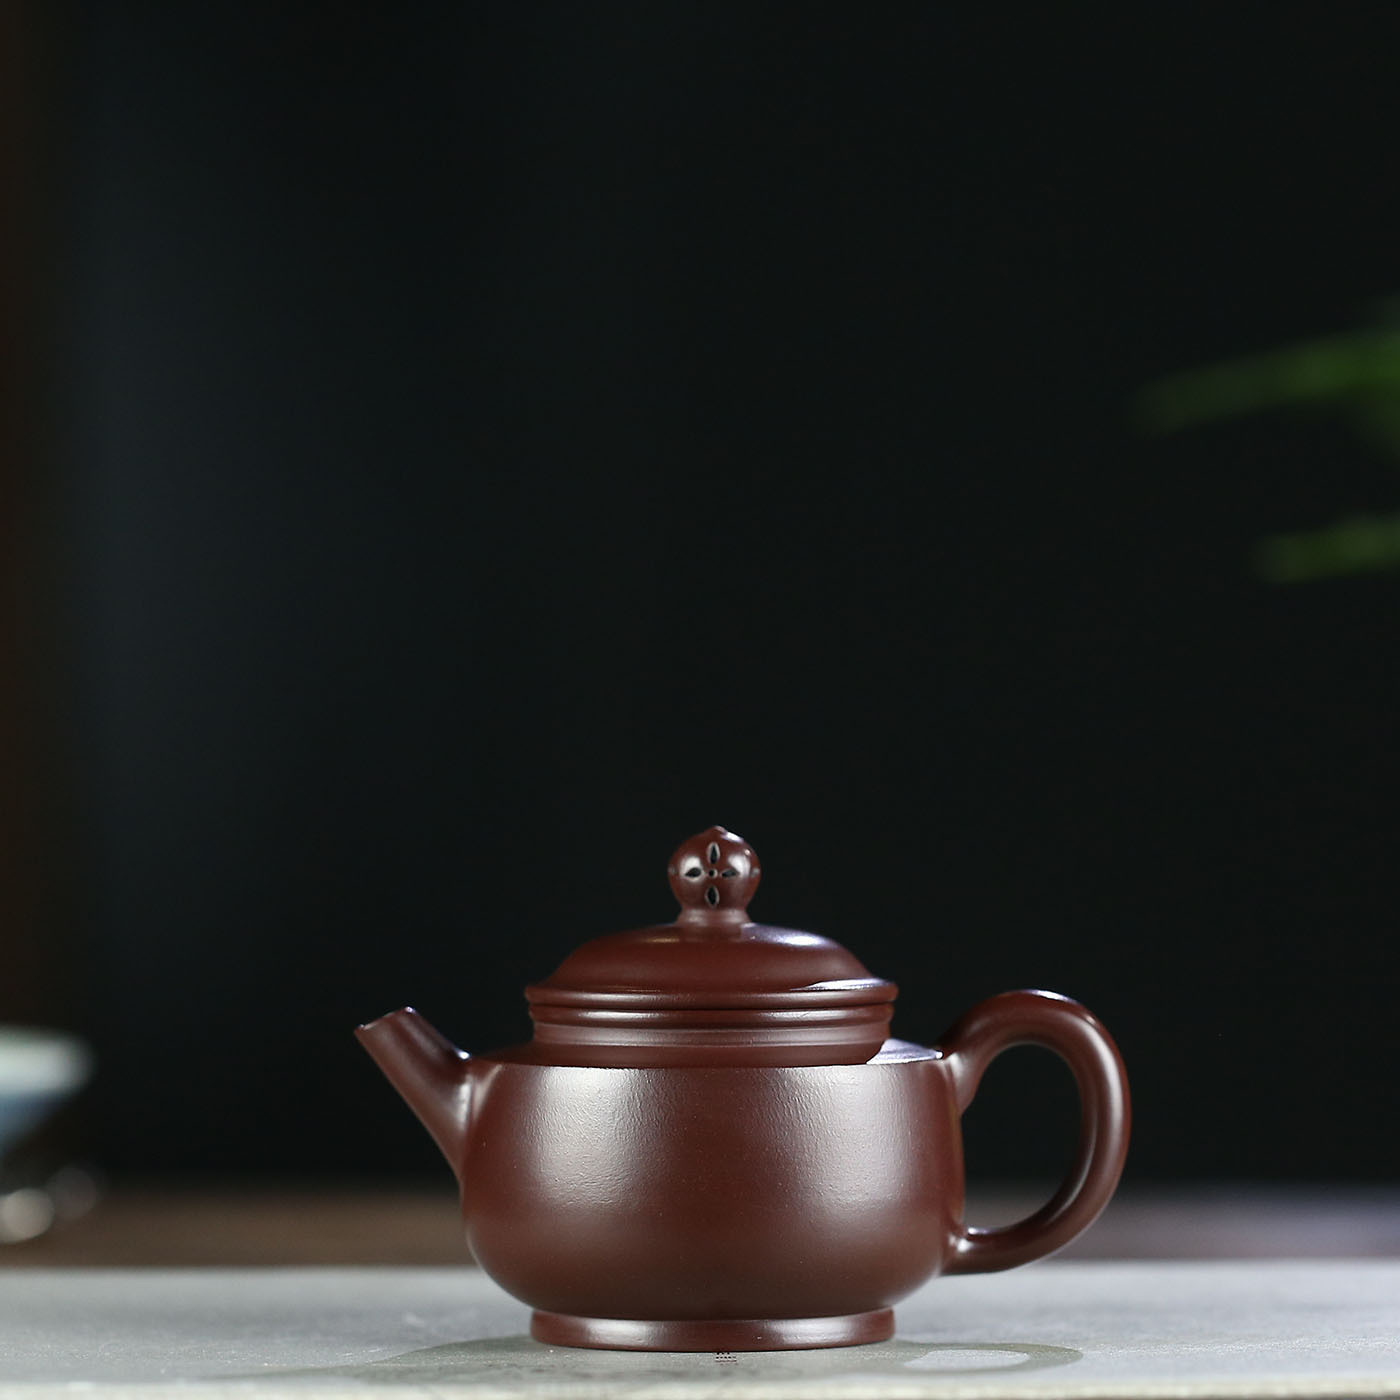 Yixing Bule de Cerâmica Esmaltada vermelho-Escuro Famosa Gu Gu Zhu Minério Bruto Roxo Lótus Manual Completo Chaleira Kungfu Online bule de Chá Conjunto